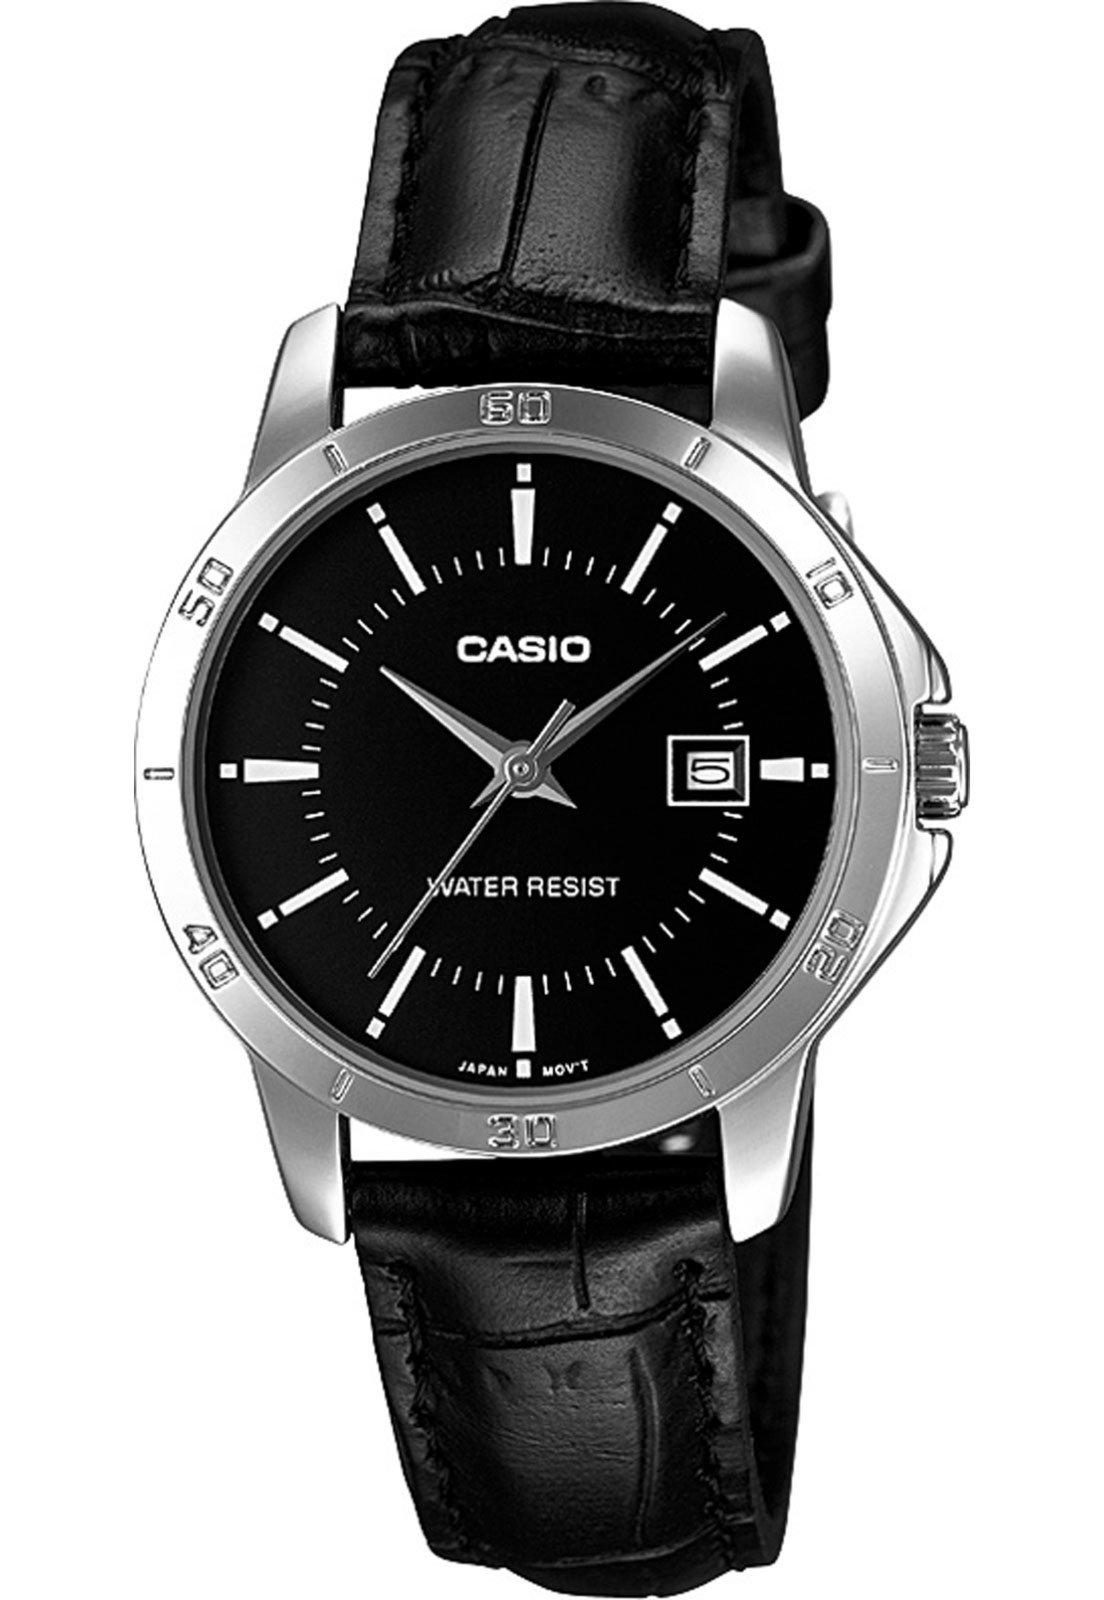 c4bfea99b Casio. Relógio Casio LTPV004L1AUDF Prata